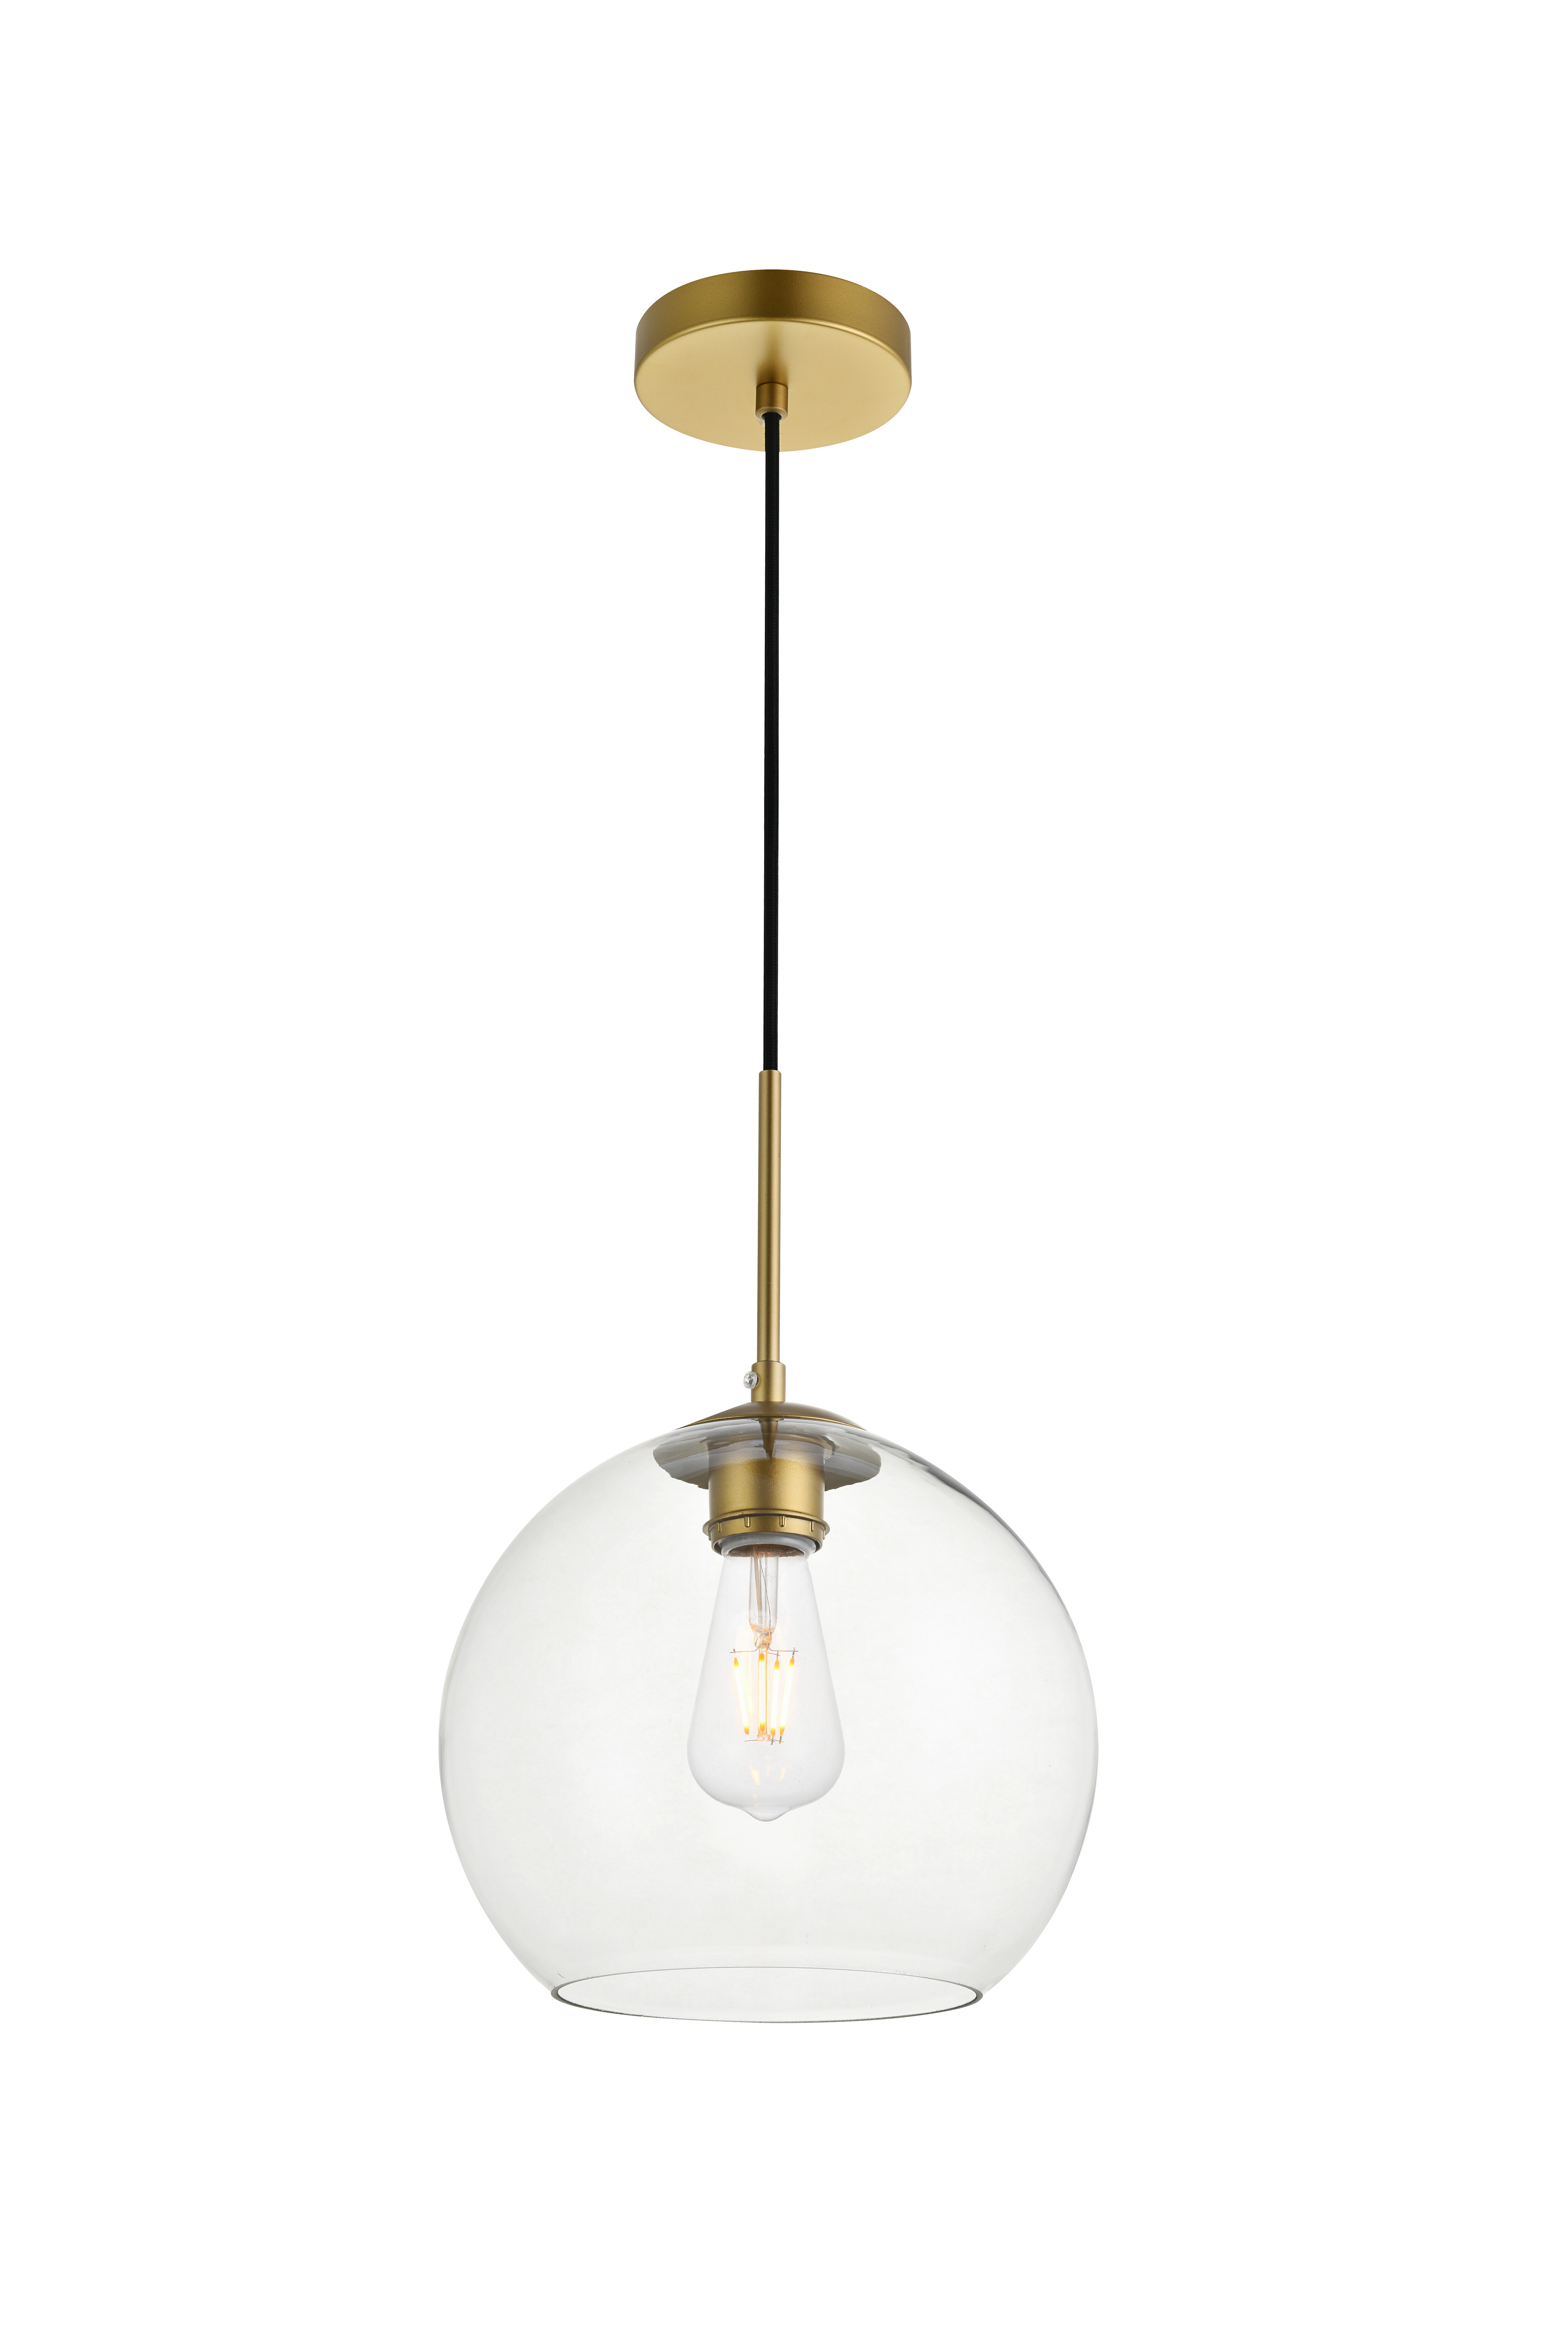 Bundy 1 Light Single Globe Pendants Within Most Current Yearwood 1 Light Single Globe Pendant (View 11 of 20)